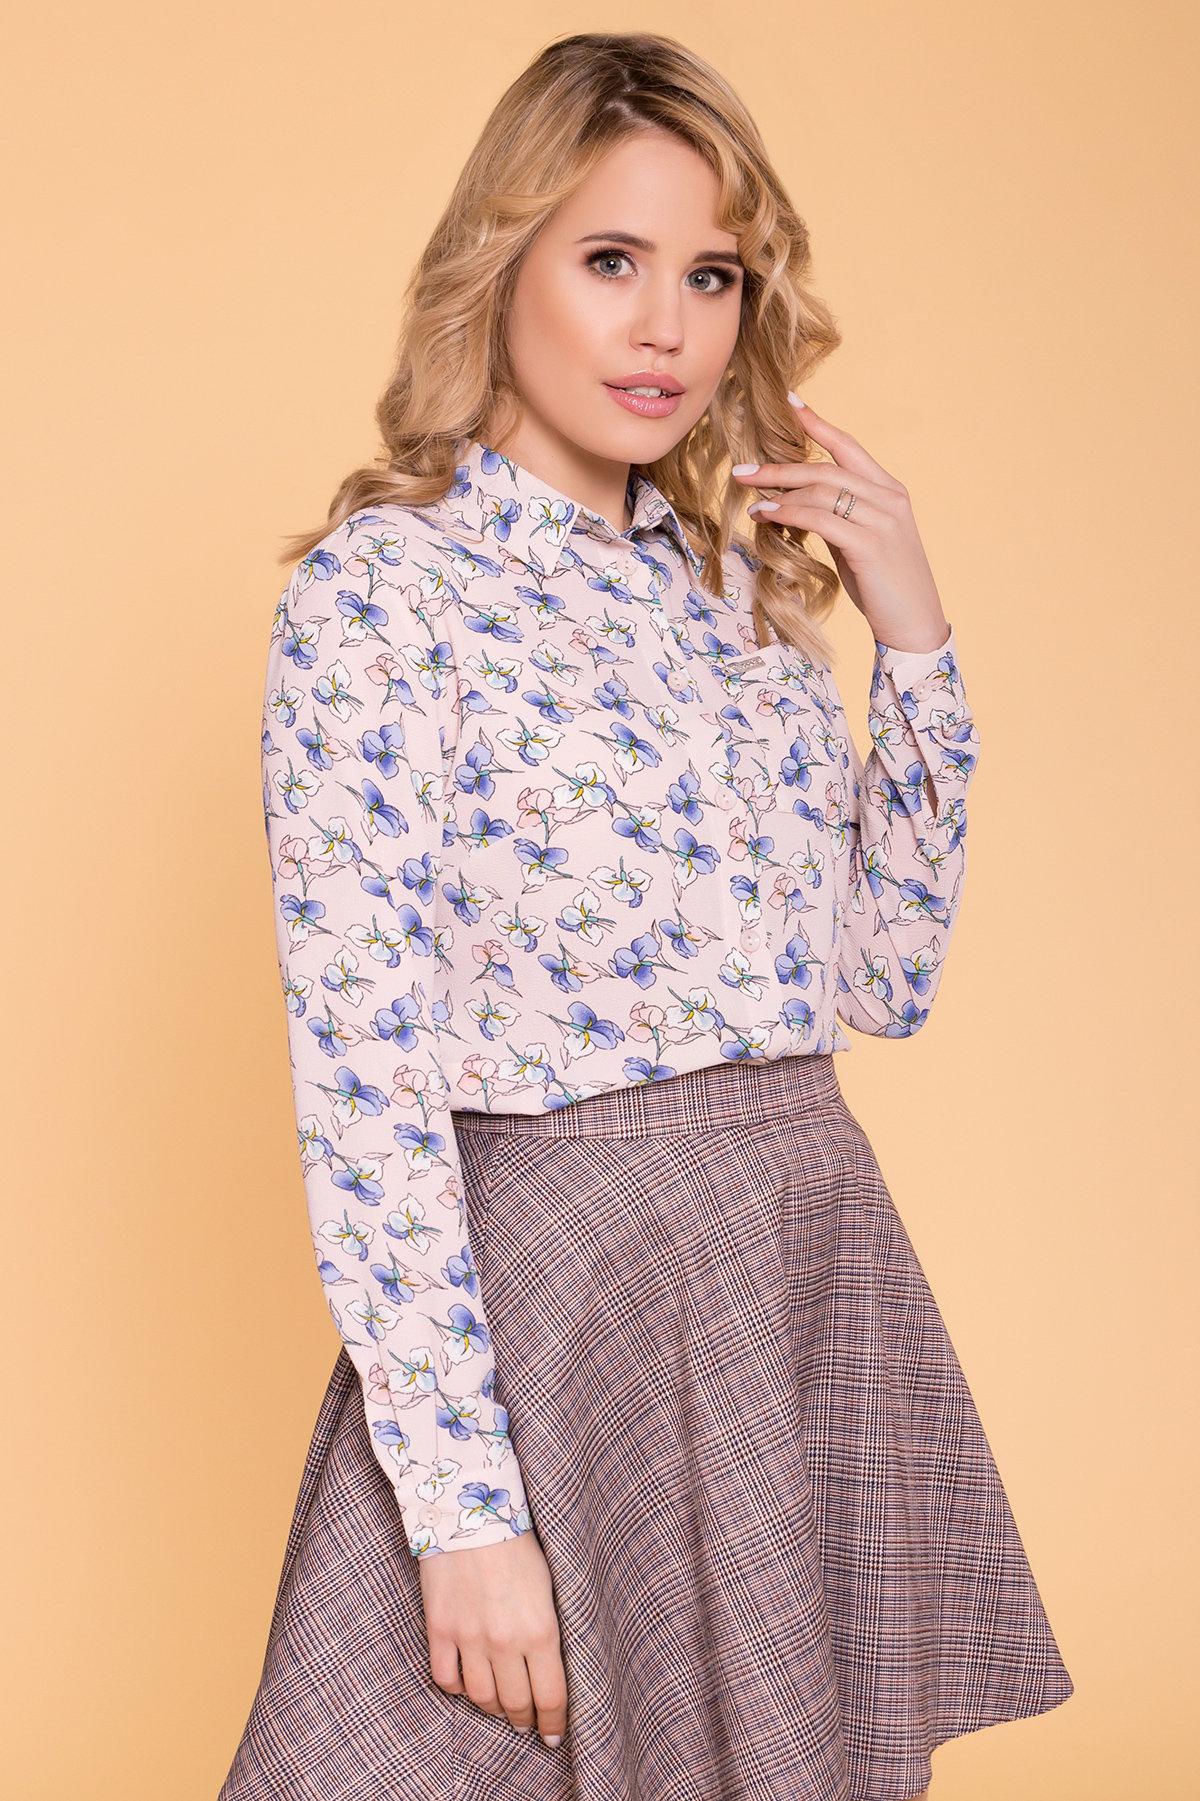 Рубашка Арсела 6790 АРТ. 41874 Цвет: Пудра/голубой ирис - фото 3, интернет магазин tm-modus.ru